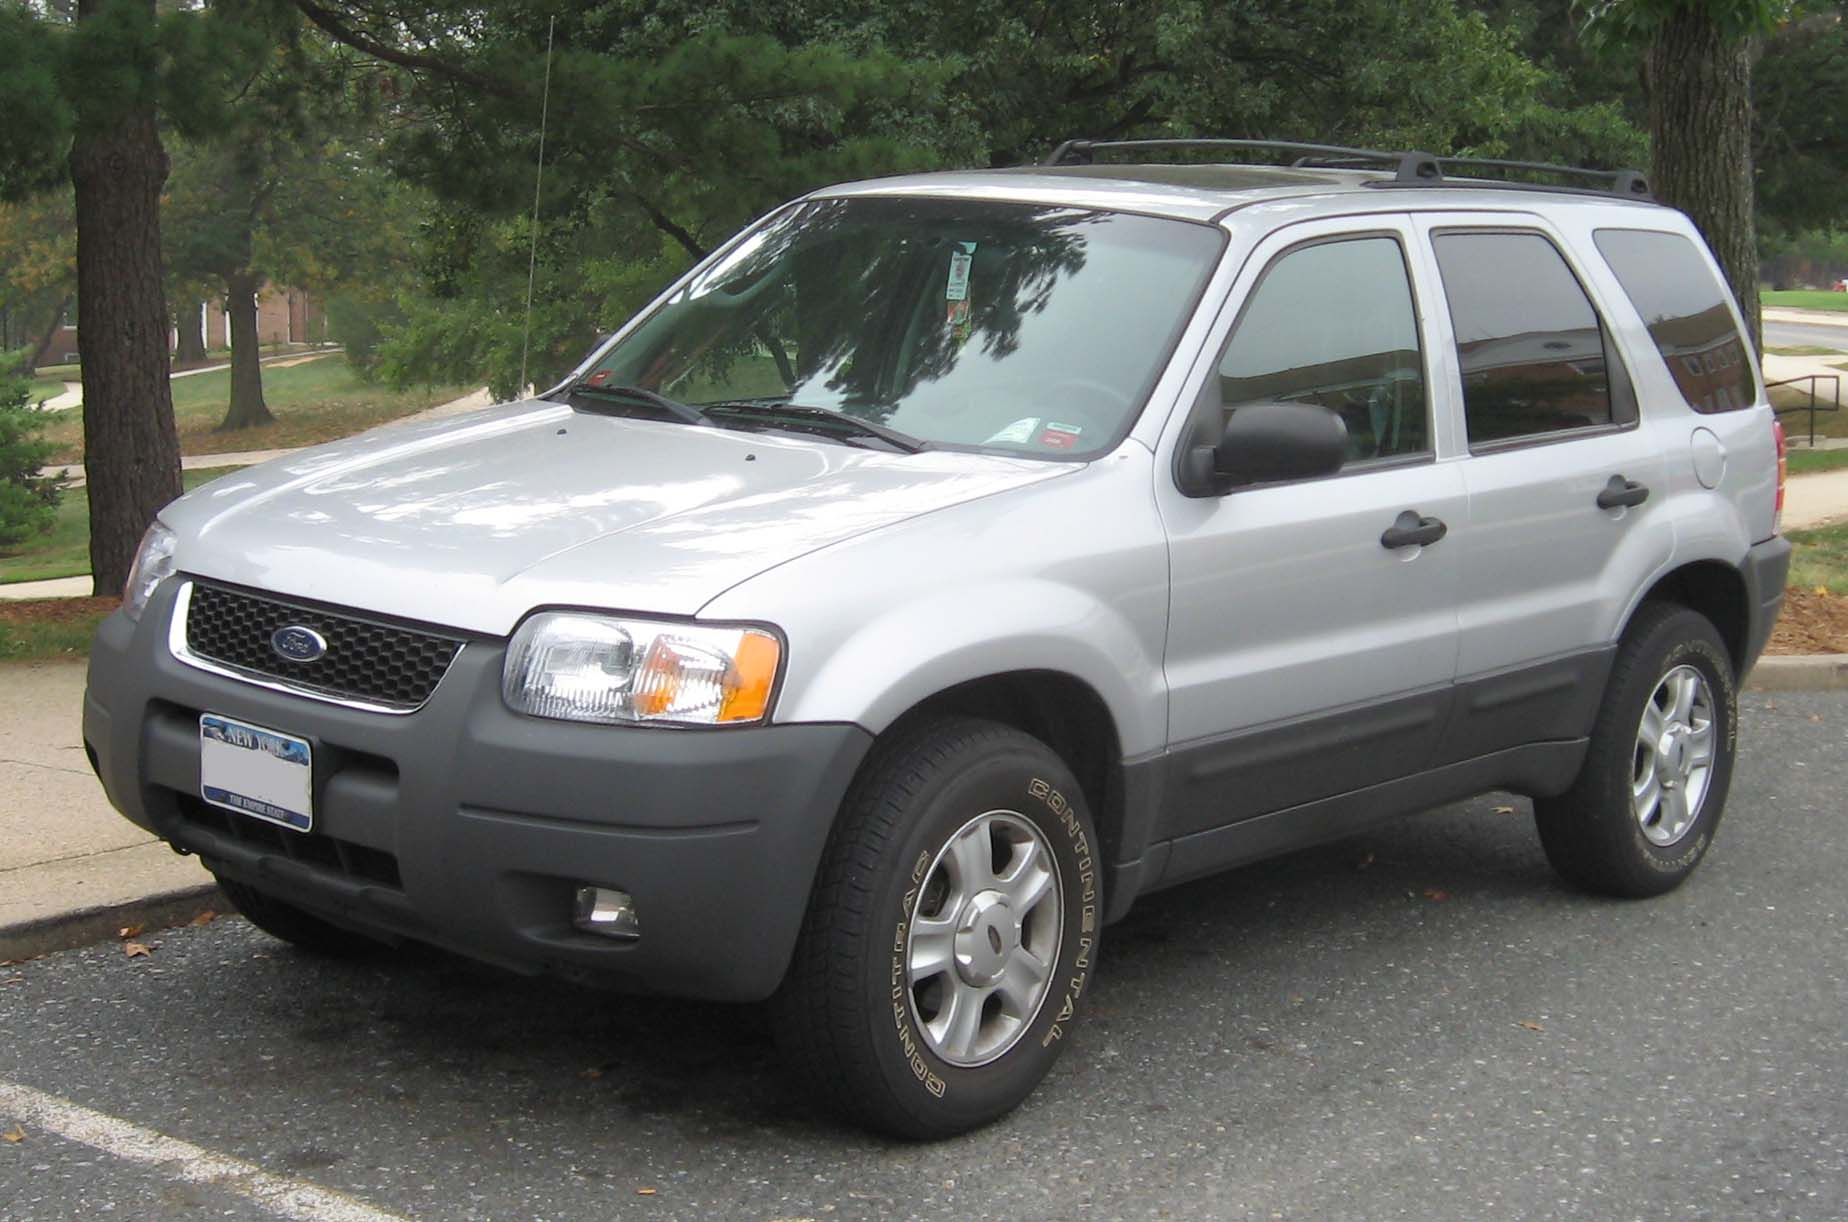 Ford Escape: Mẫu xe từng một thời vang dội